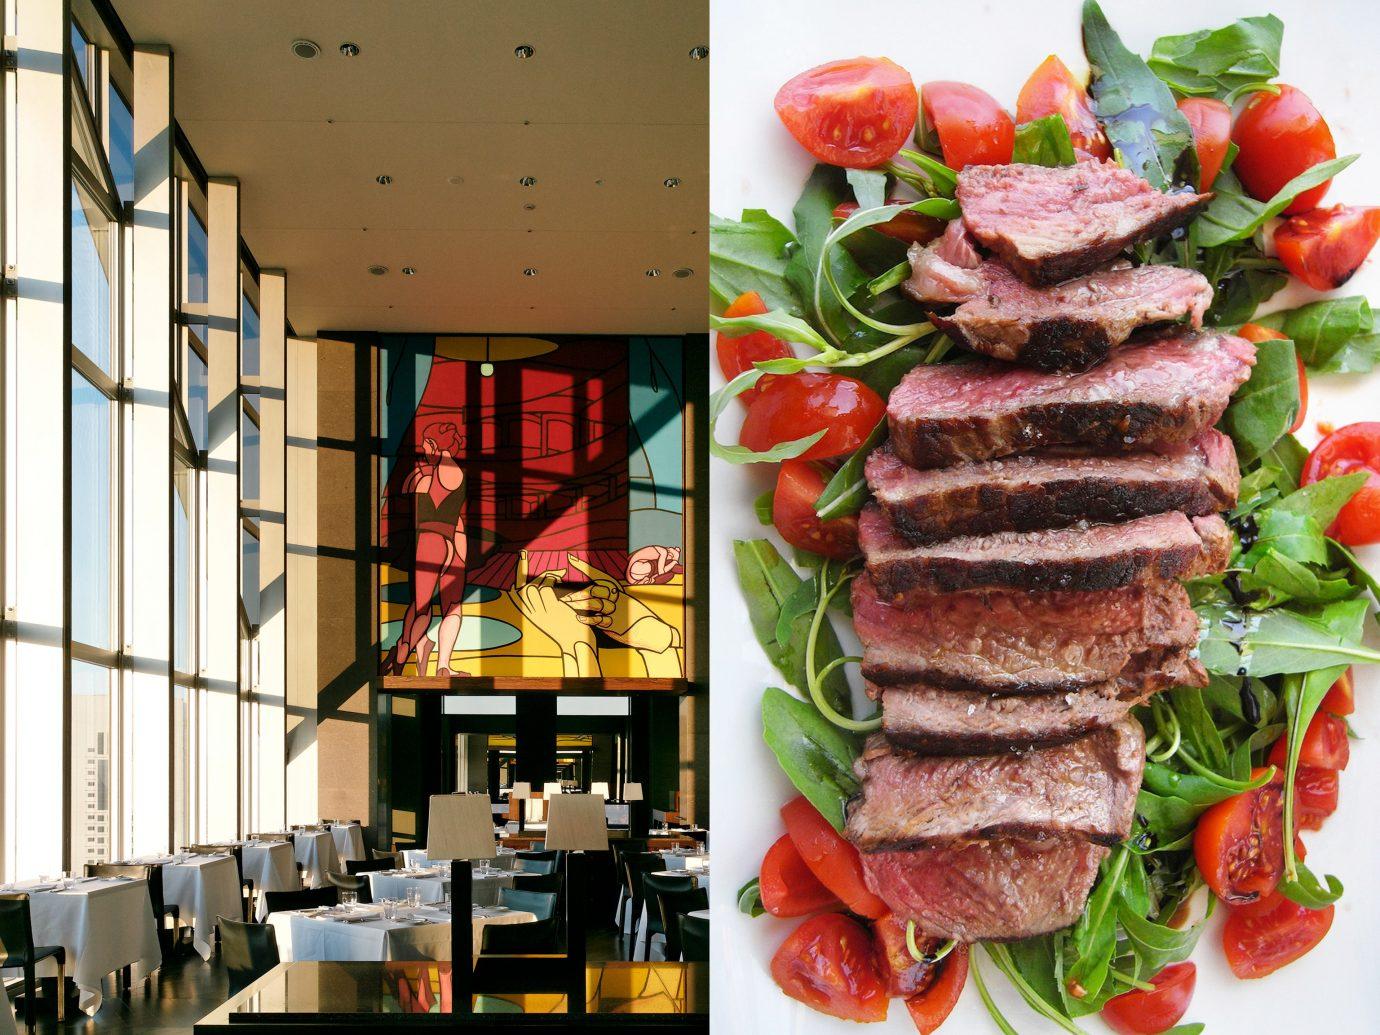 Jetsetter Guides indoor dish food meal meat restaurant brunch lunch cuisine fresh